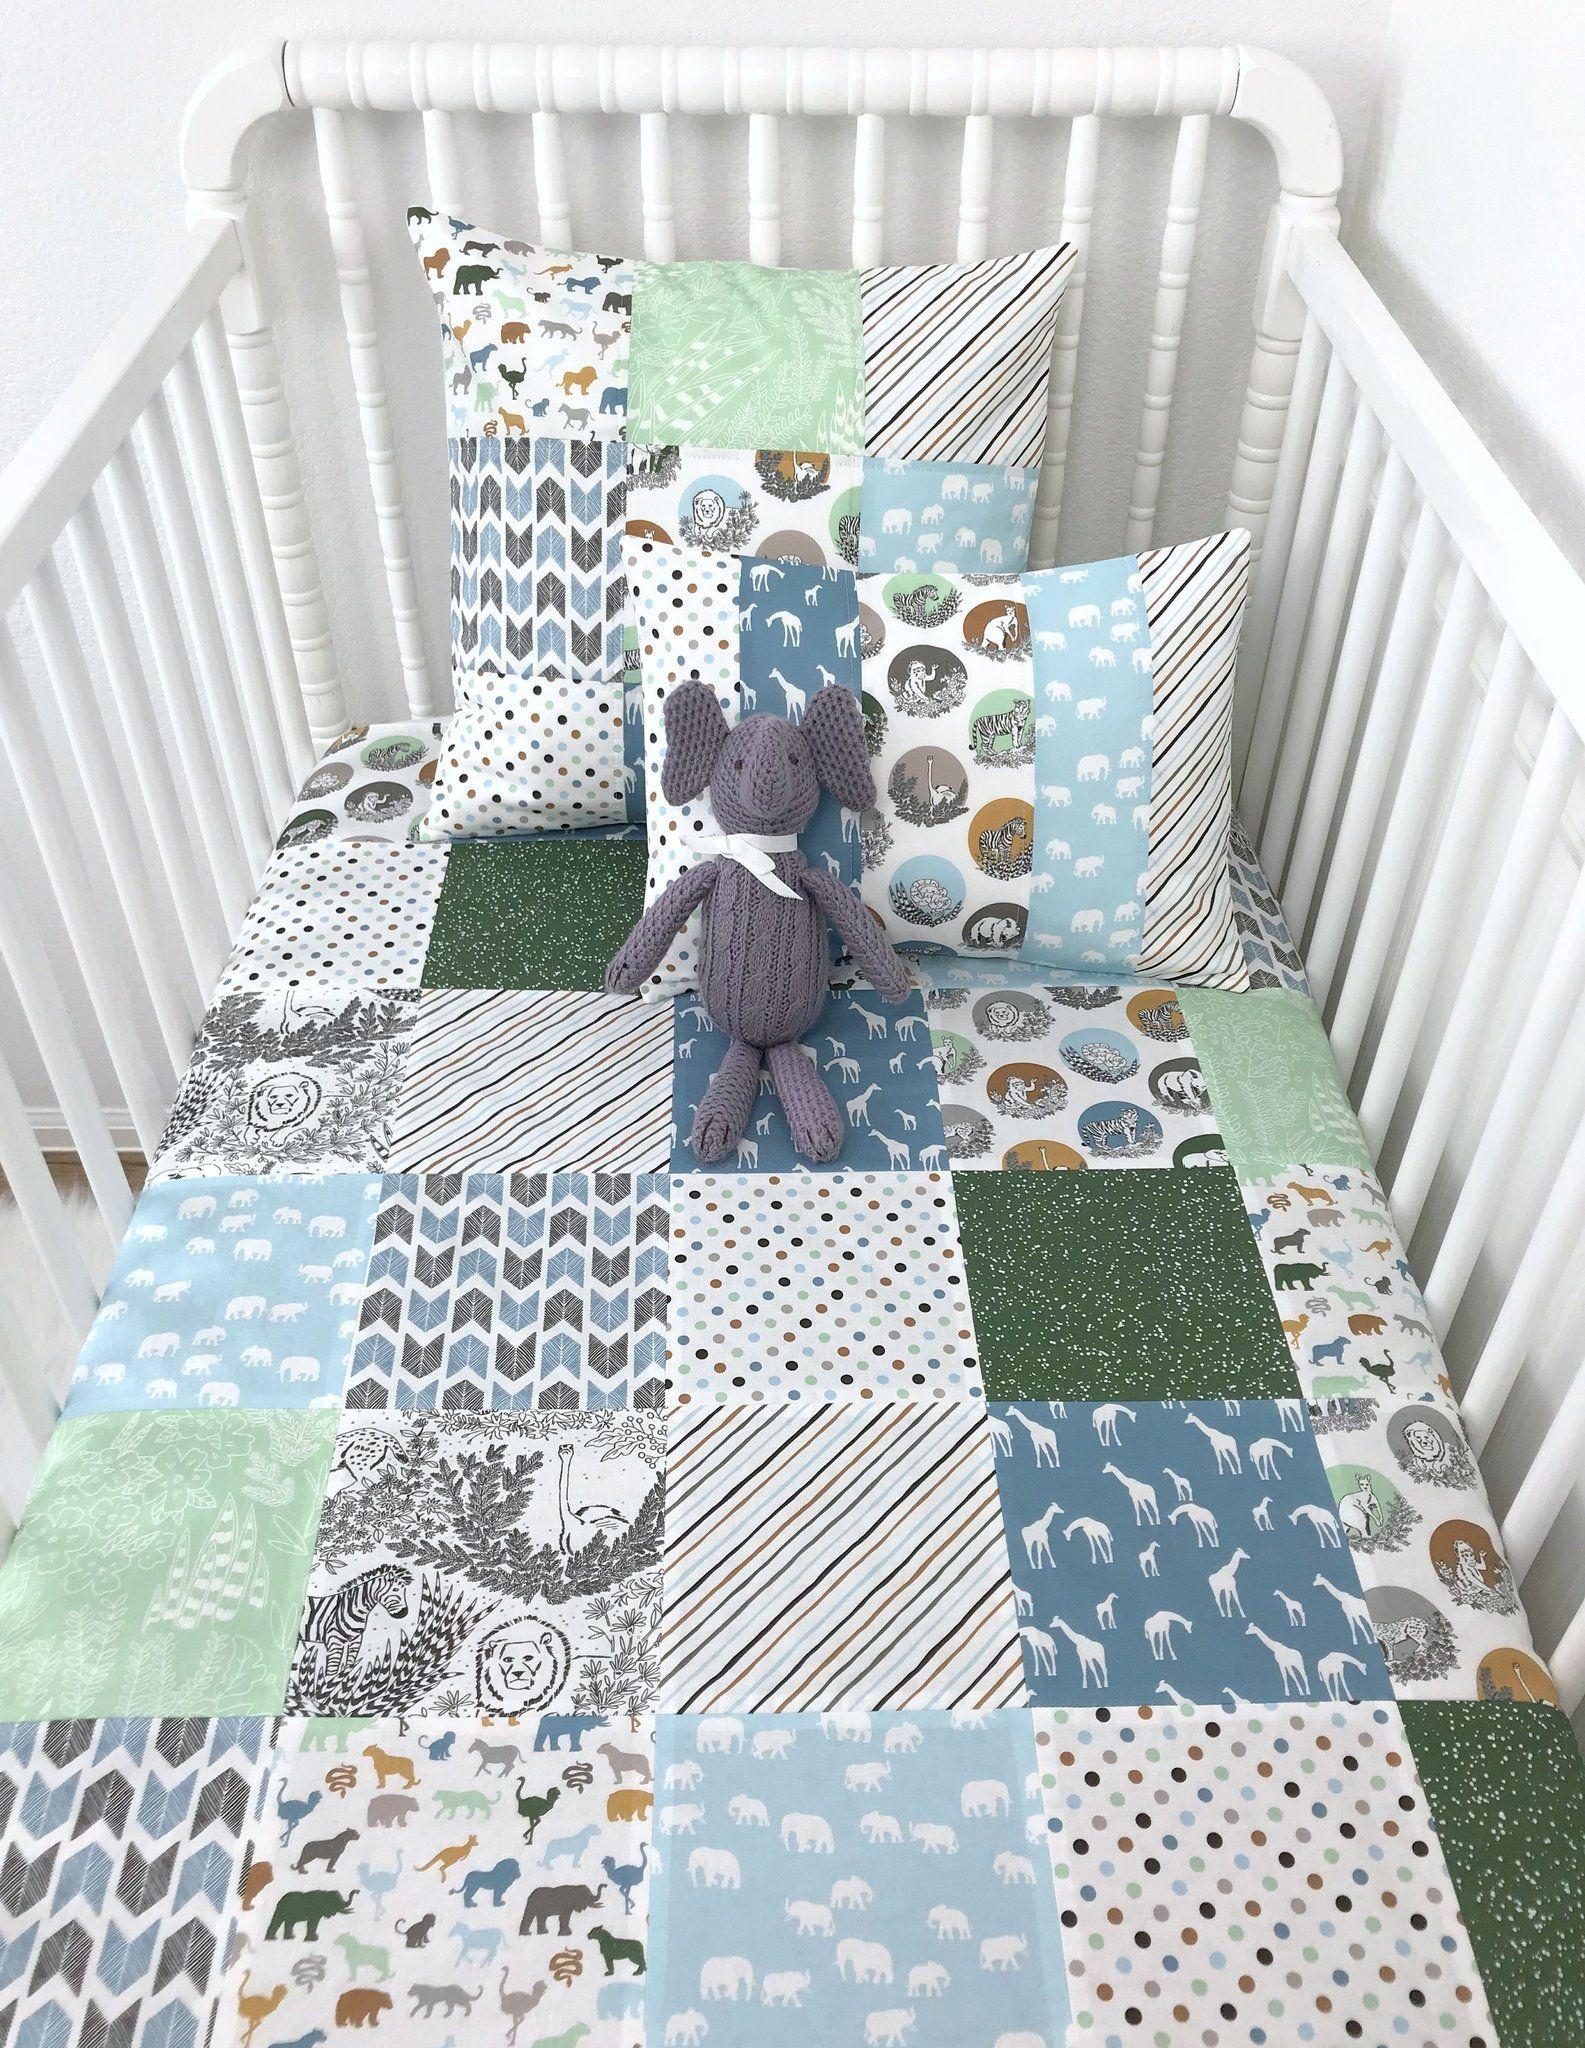 Zoo Animal Baby Blanket Jungle Animal Crib Bedding Baby Shower Gift Patchwork Baby Quilt Crib Bedding Kids Bunk Beds Crib Bedding Boy